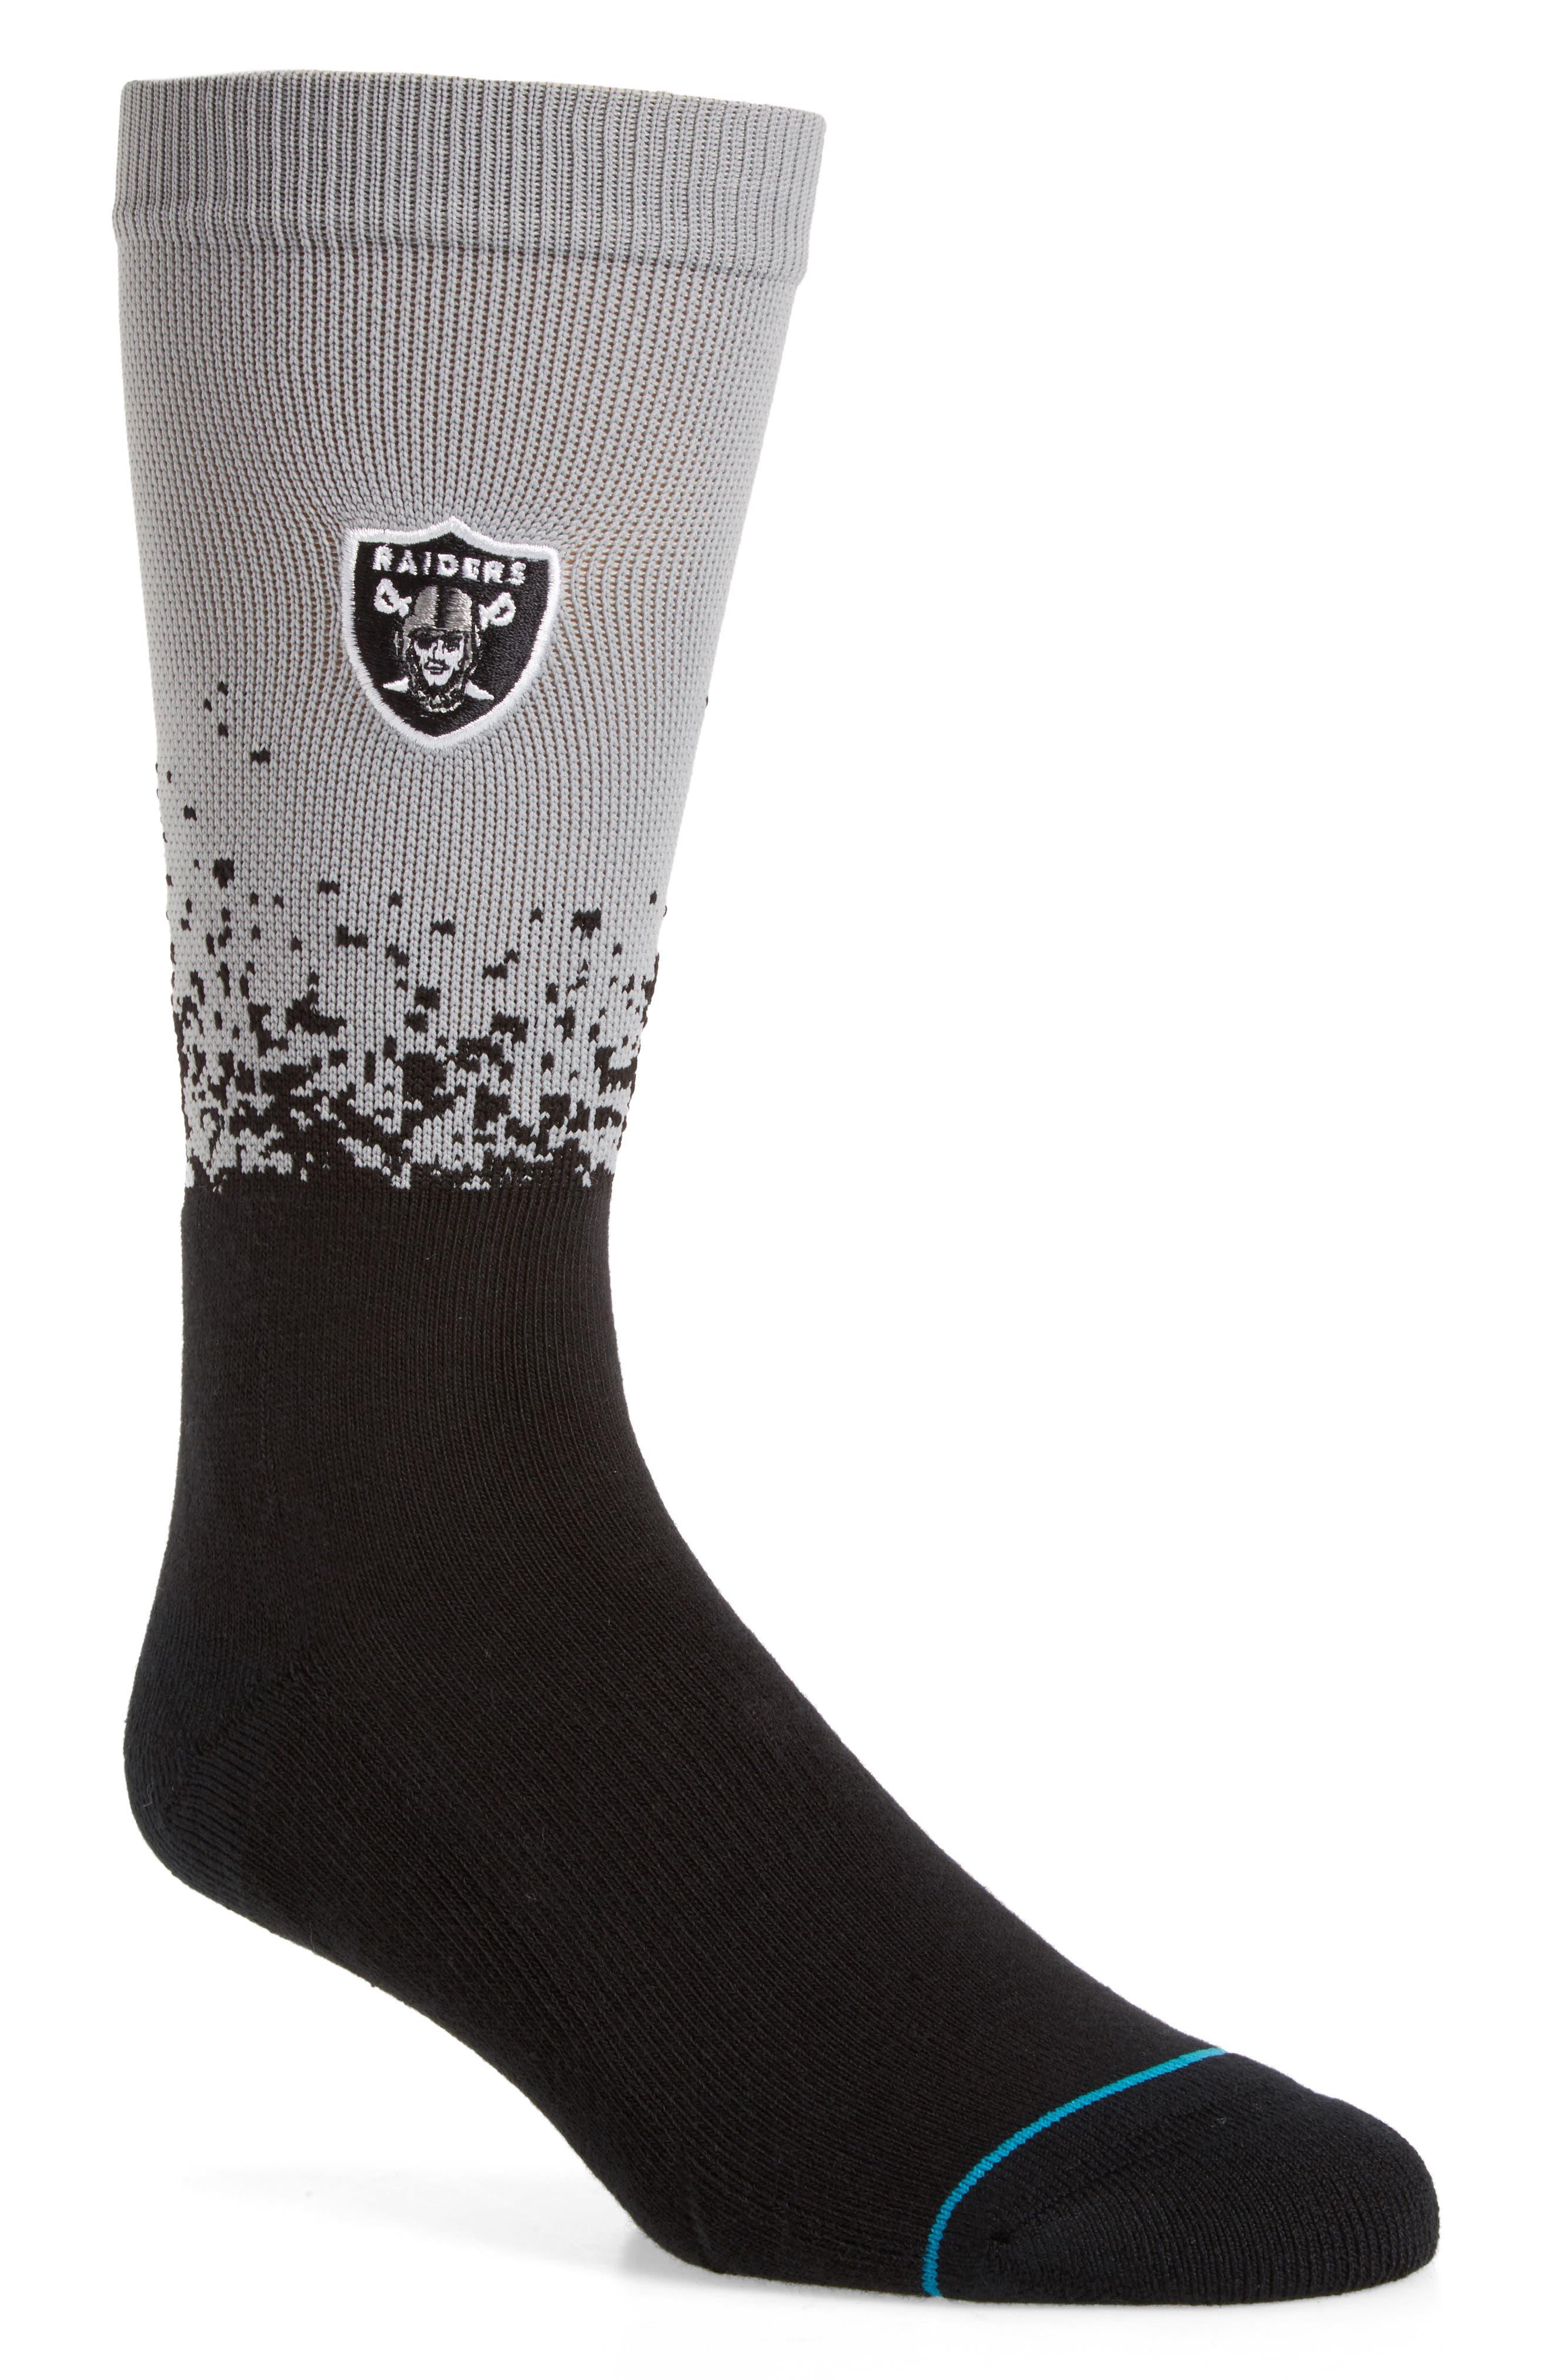 Oakland Raiders - Fade Socks,                         Main,                         color, Black